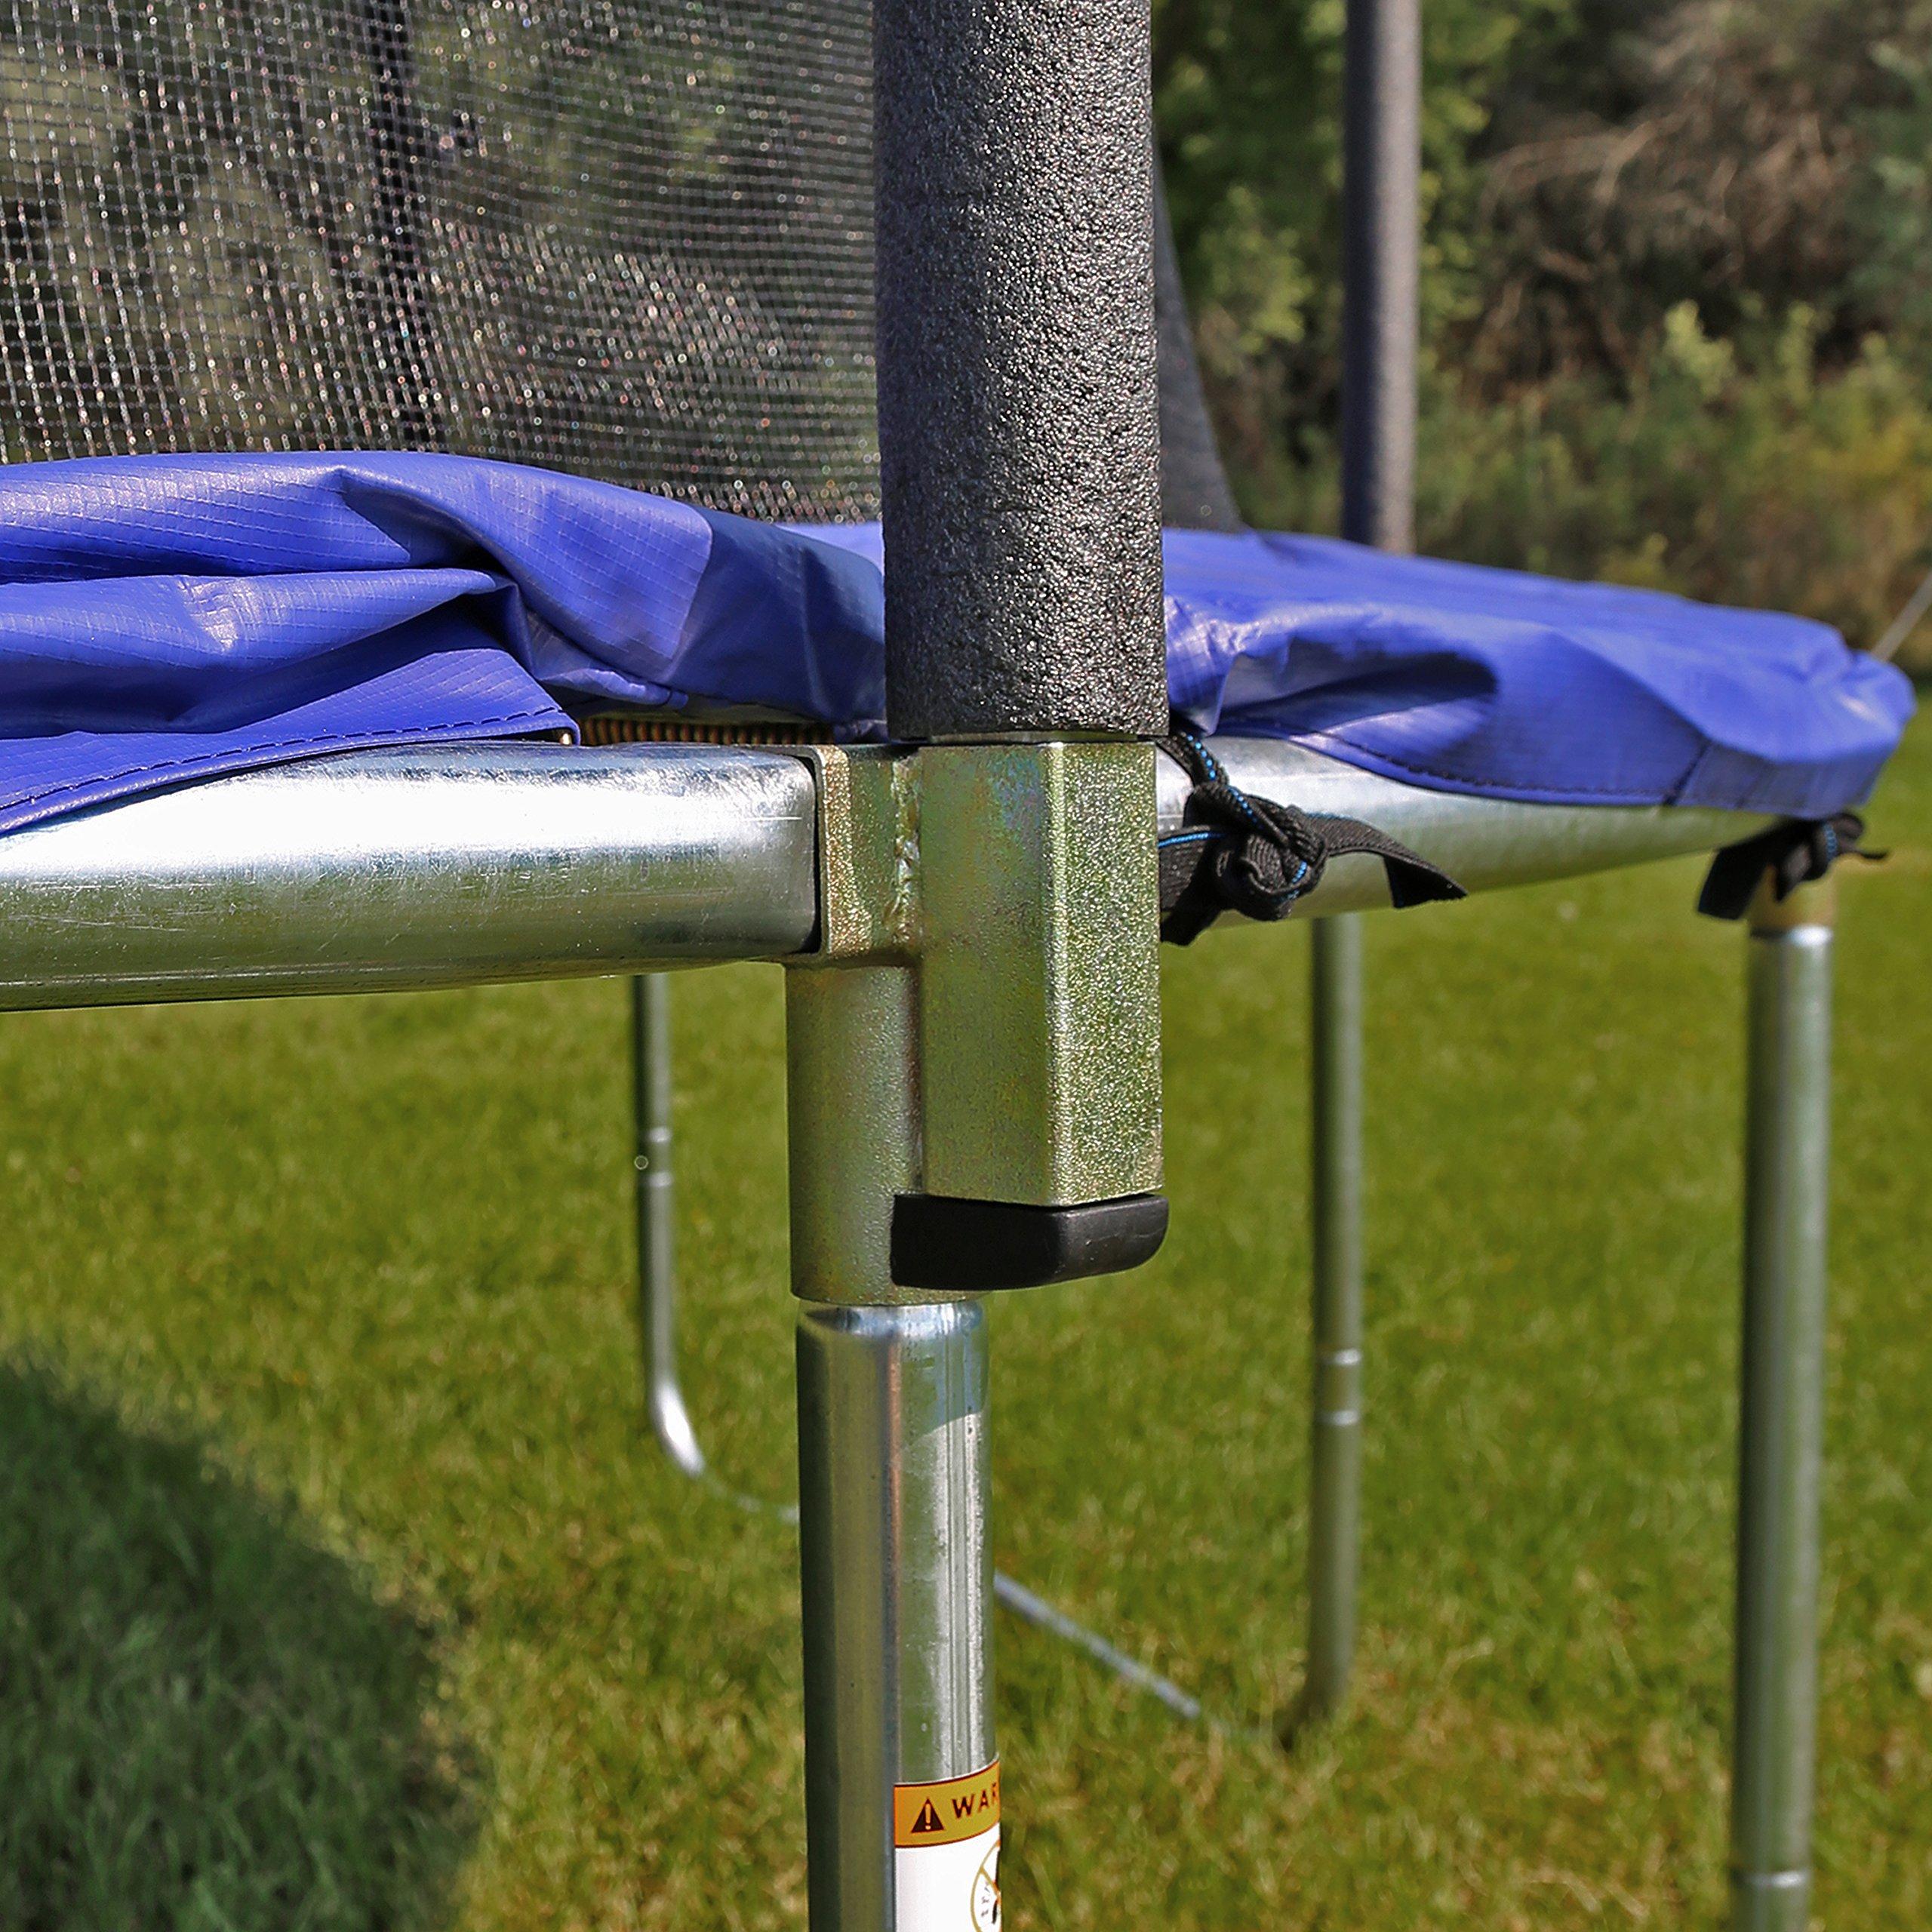 Skywalker Trampolines 12-Foot Jump N' Dunk Trampoline with Enclosure Net - Basketball Trampoline by Skywalker Trampolines (Image #6)